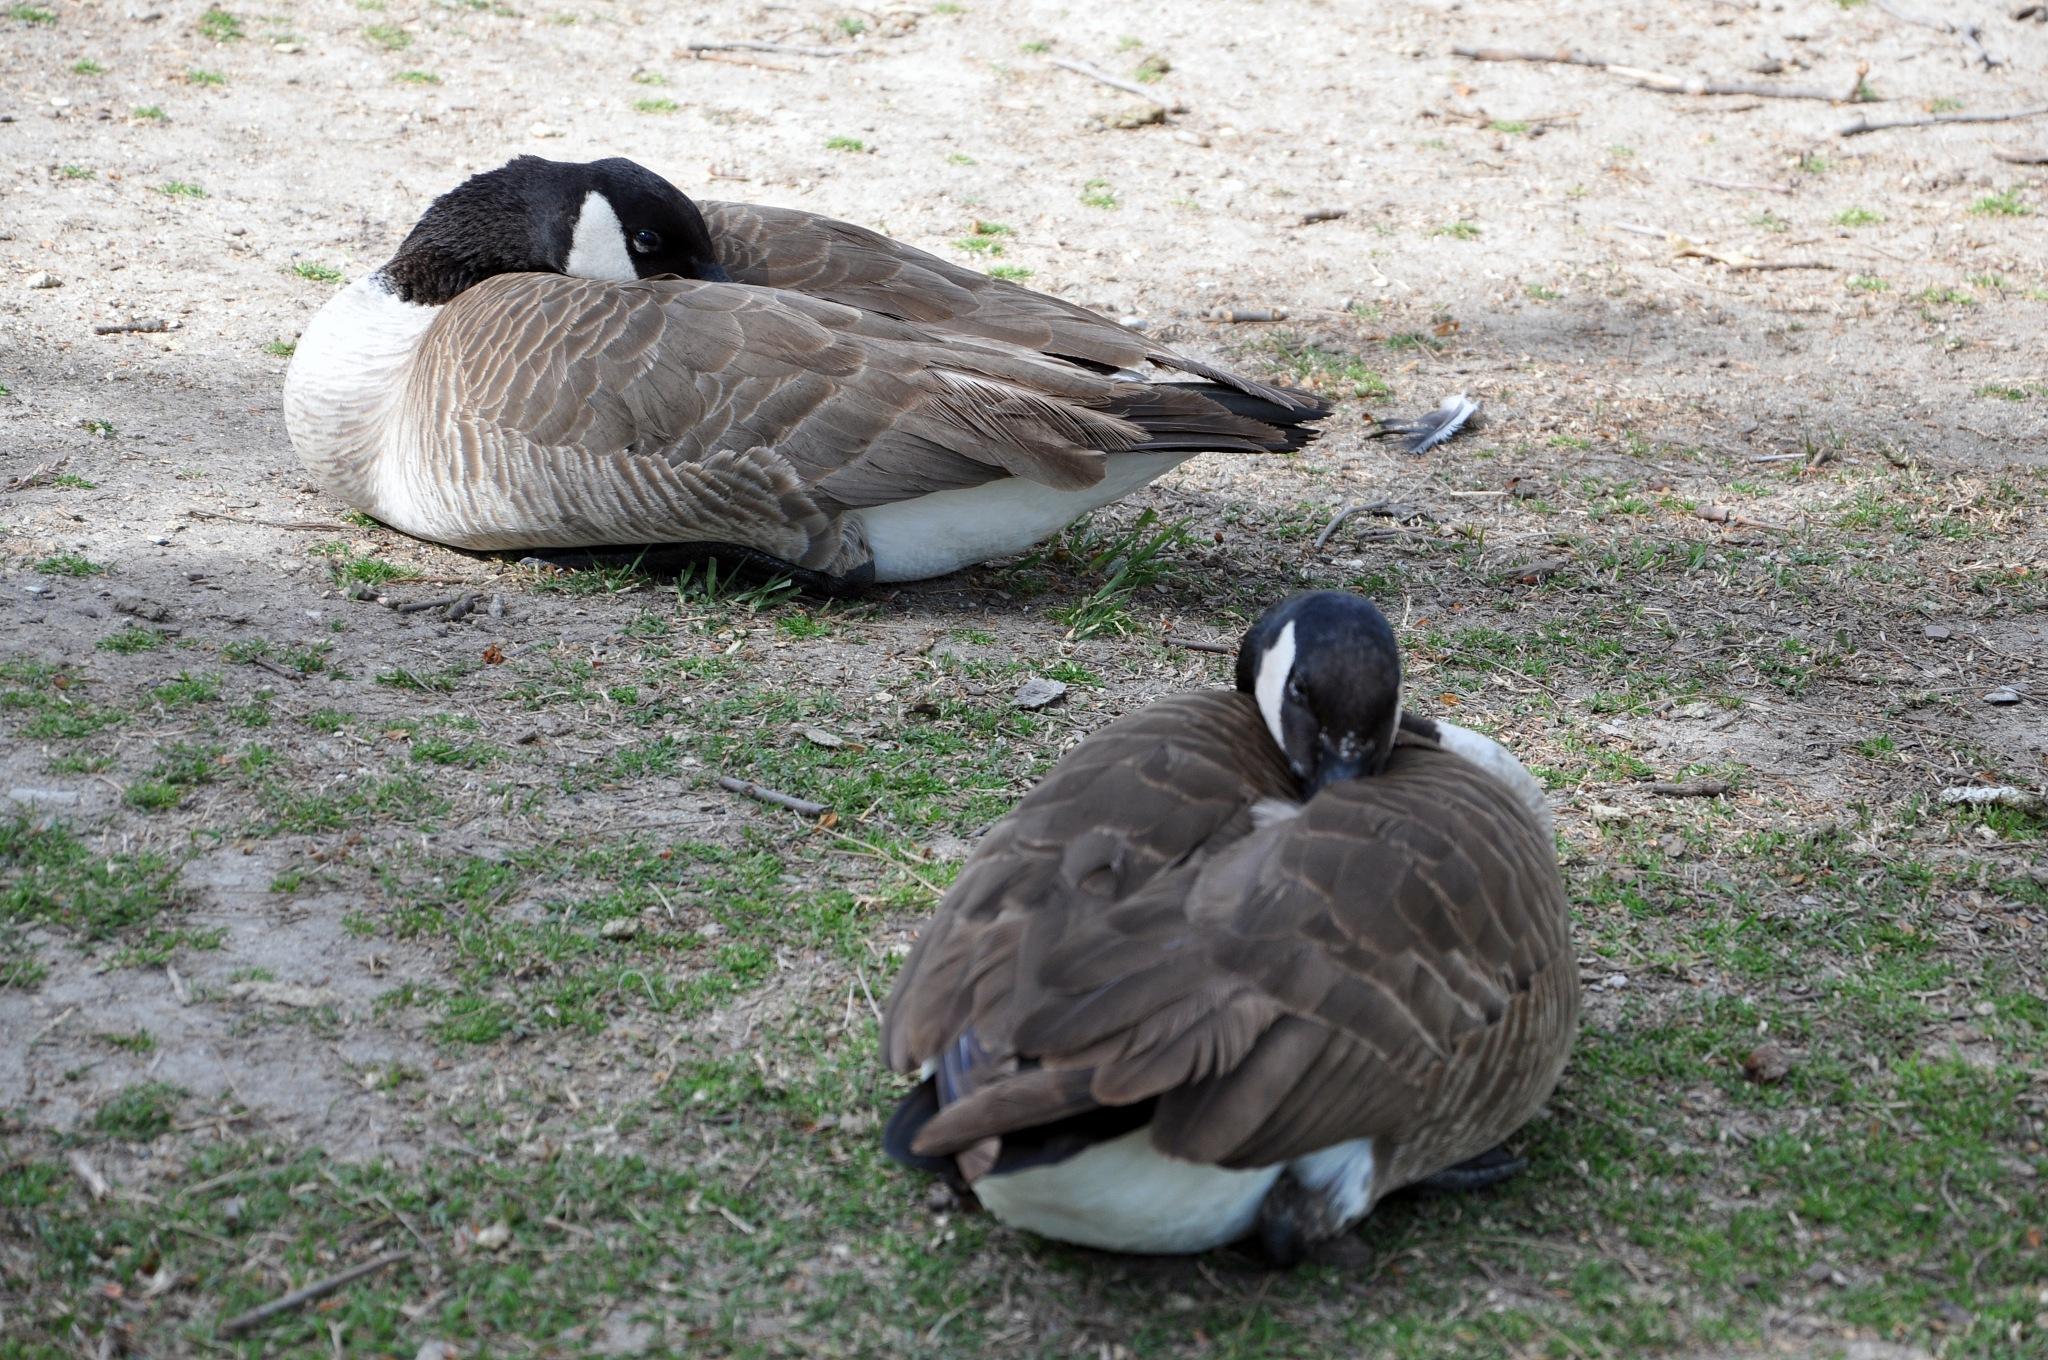 A Day at Duck Park by Lisa Nason